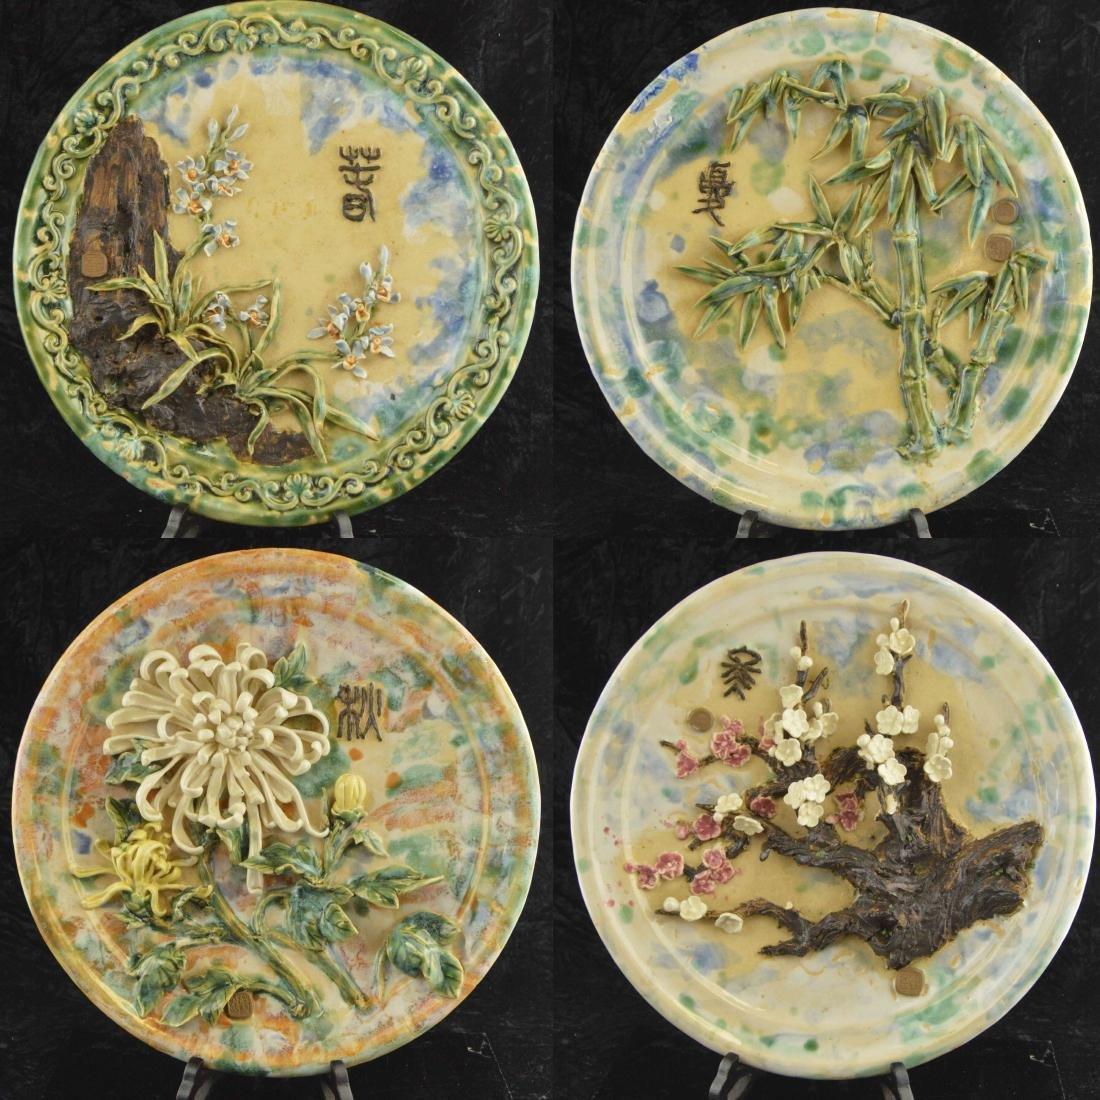 Four Season Porcelain Plate